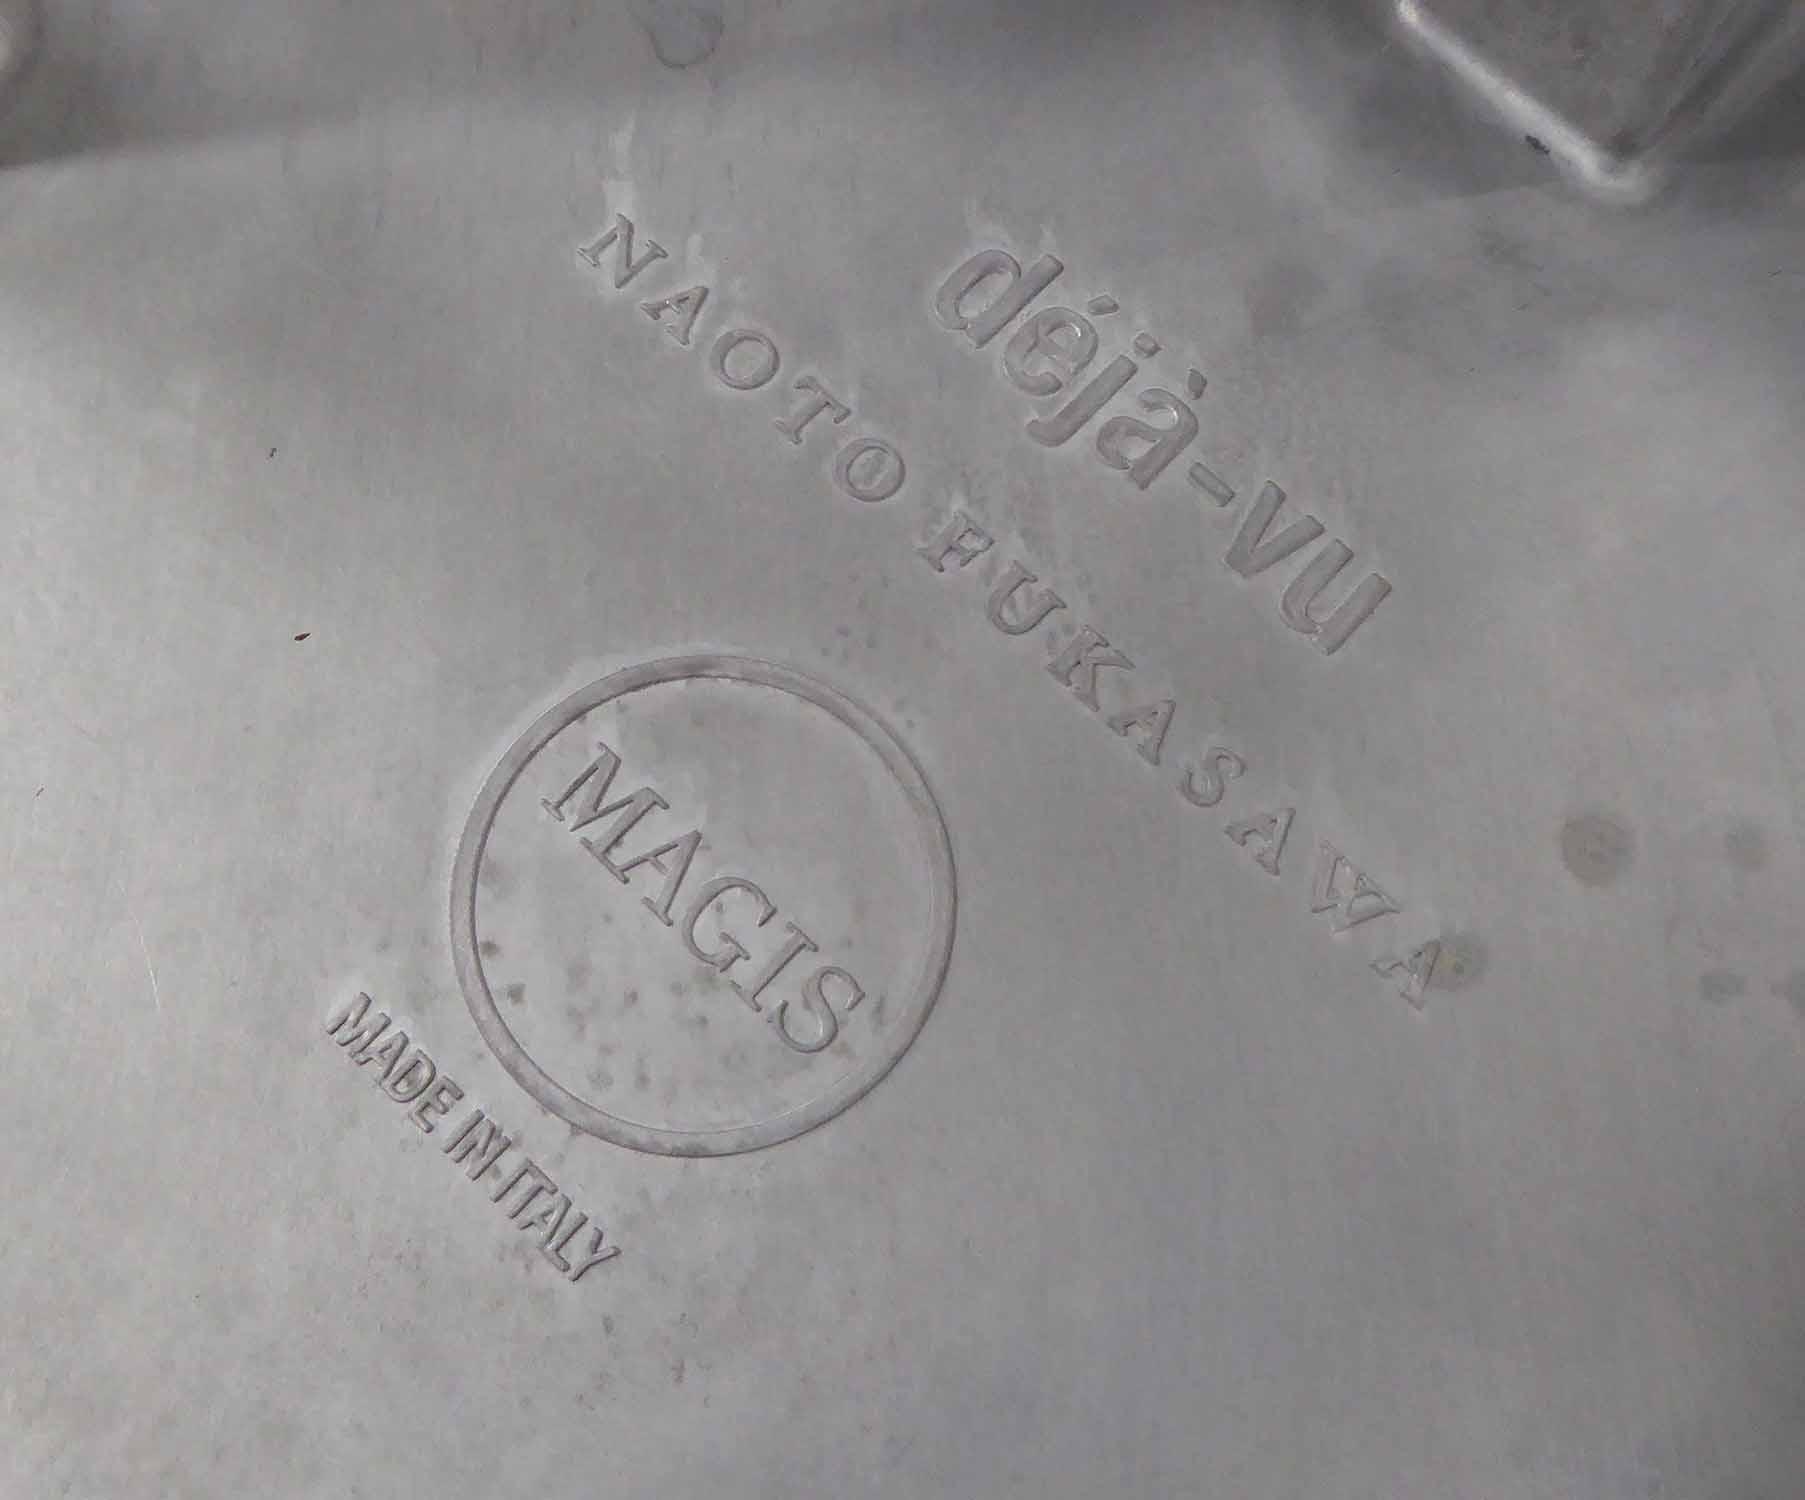 Lot 27 - BAR STOOLS, a set of four, aluminium 'Desta Vu' by Naoto Fukasawa, each 78cm H, by Magis Italy.